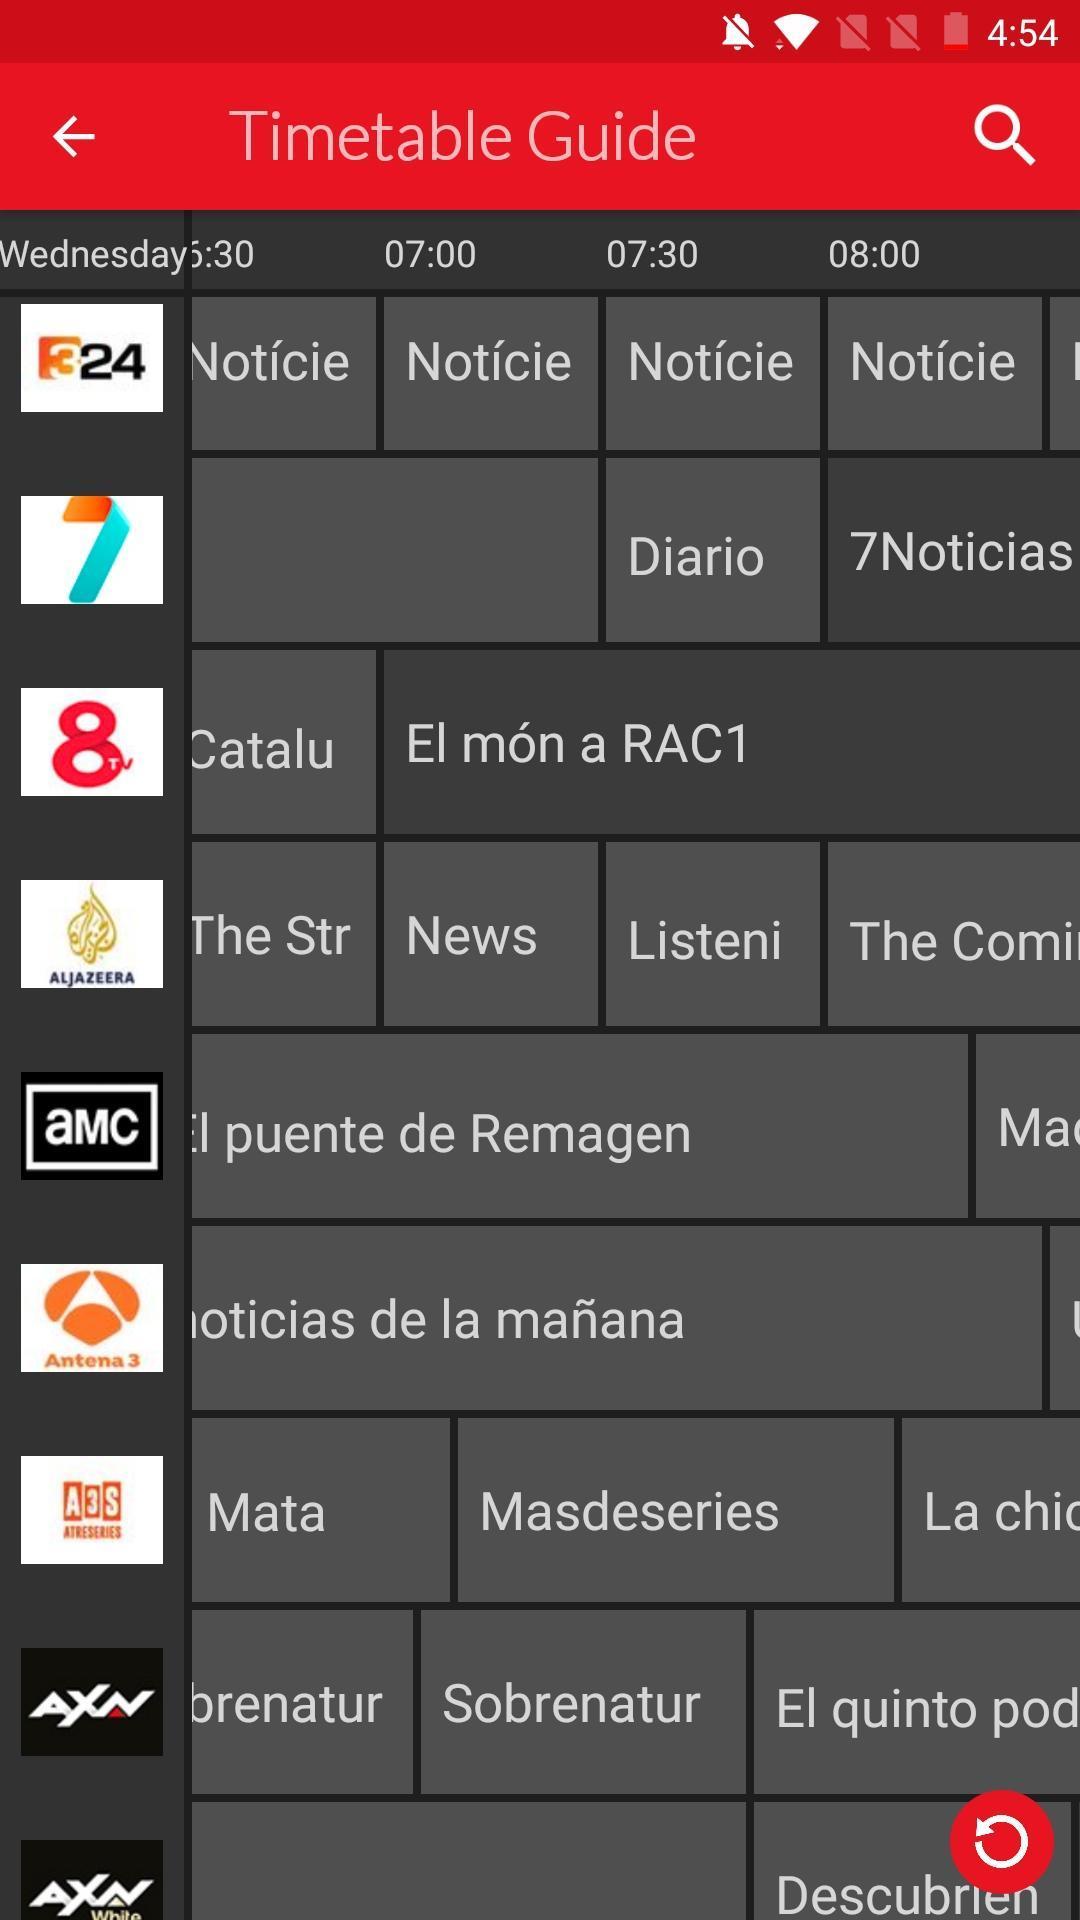 Antena 3 Spain